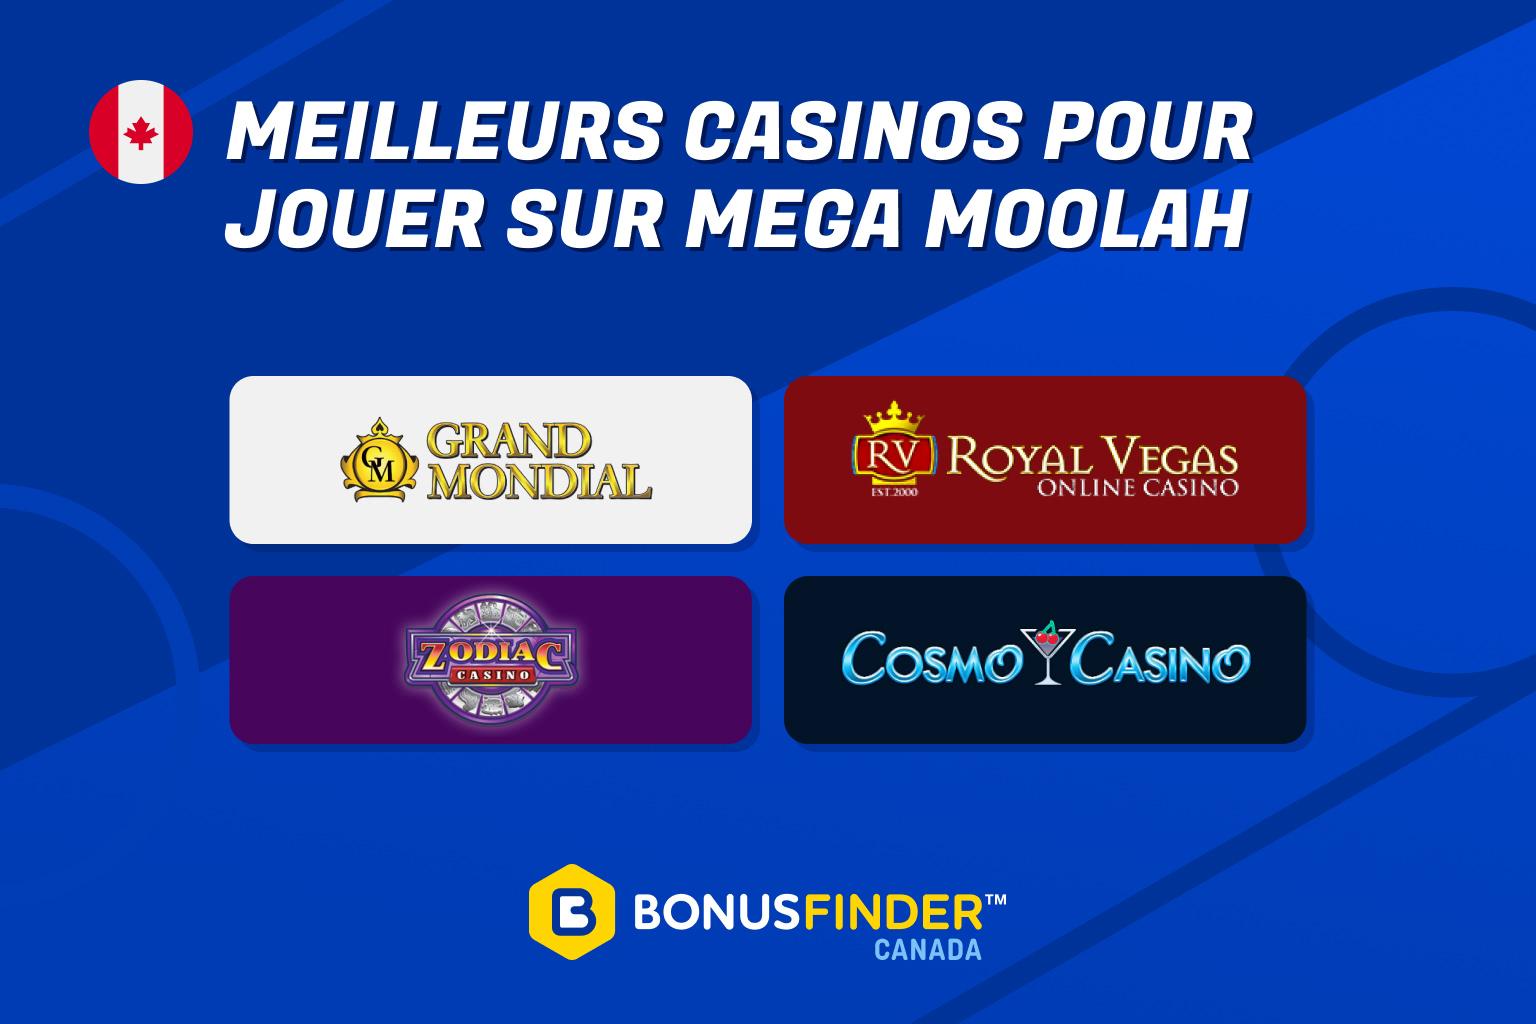 mega moolah casinos